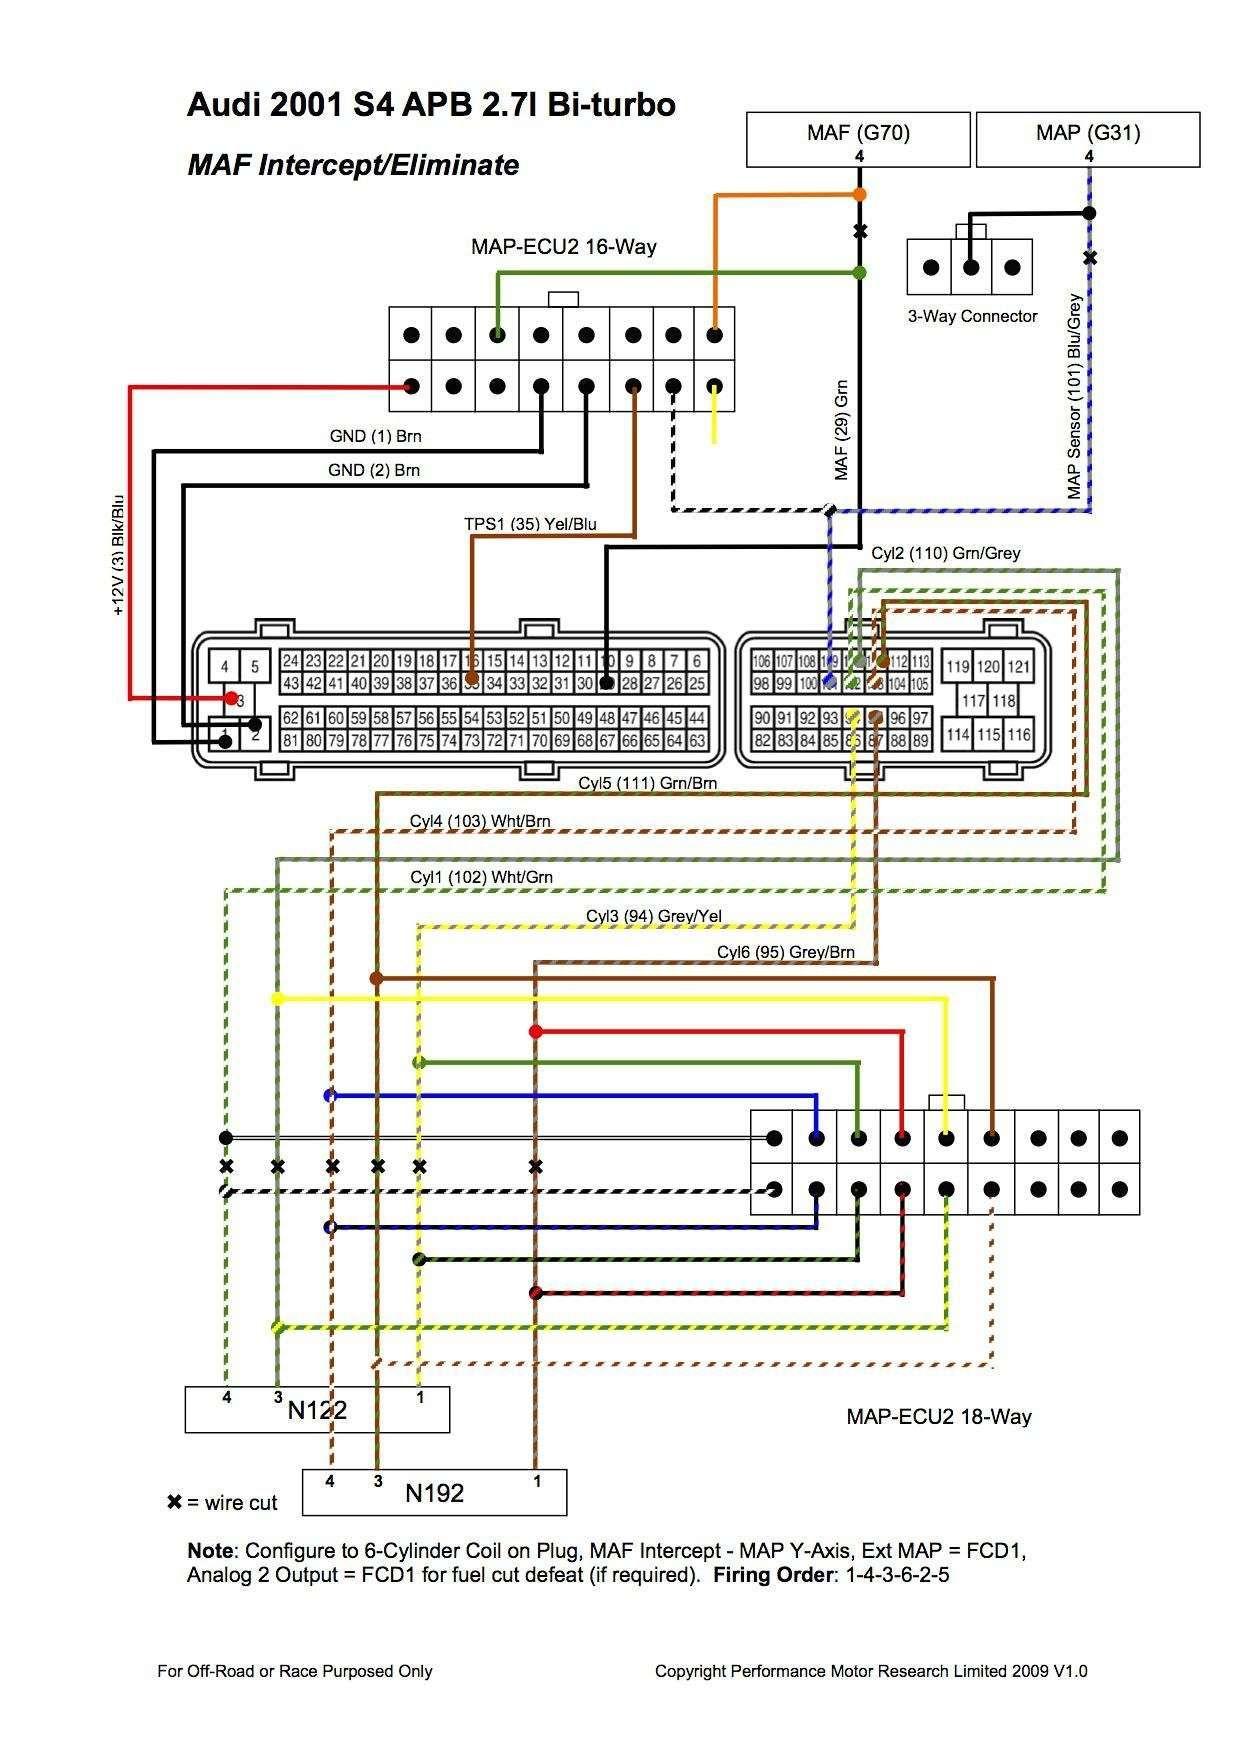 98 civic wiring diagram security data diagram schematic 98 civic wiring diagram security [ 1239 x 1754 Pixel ]